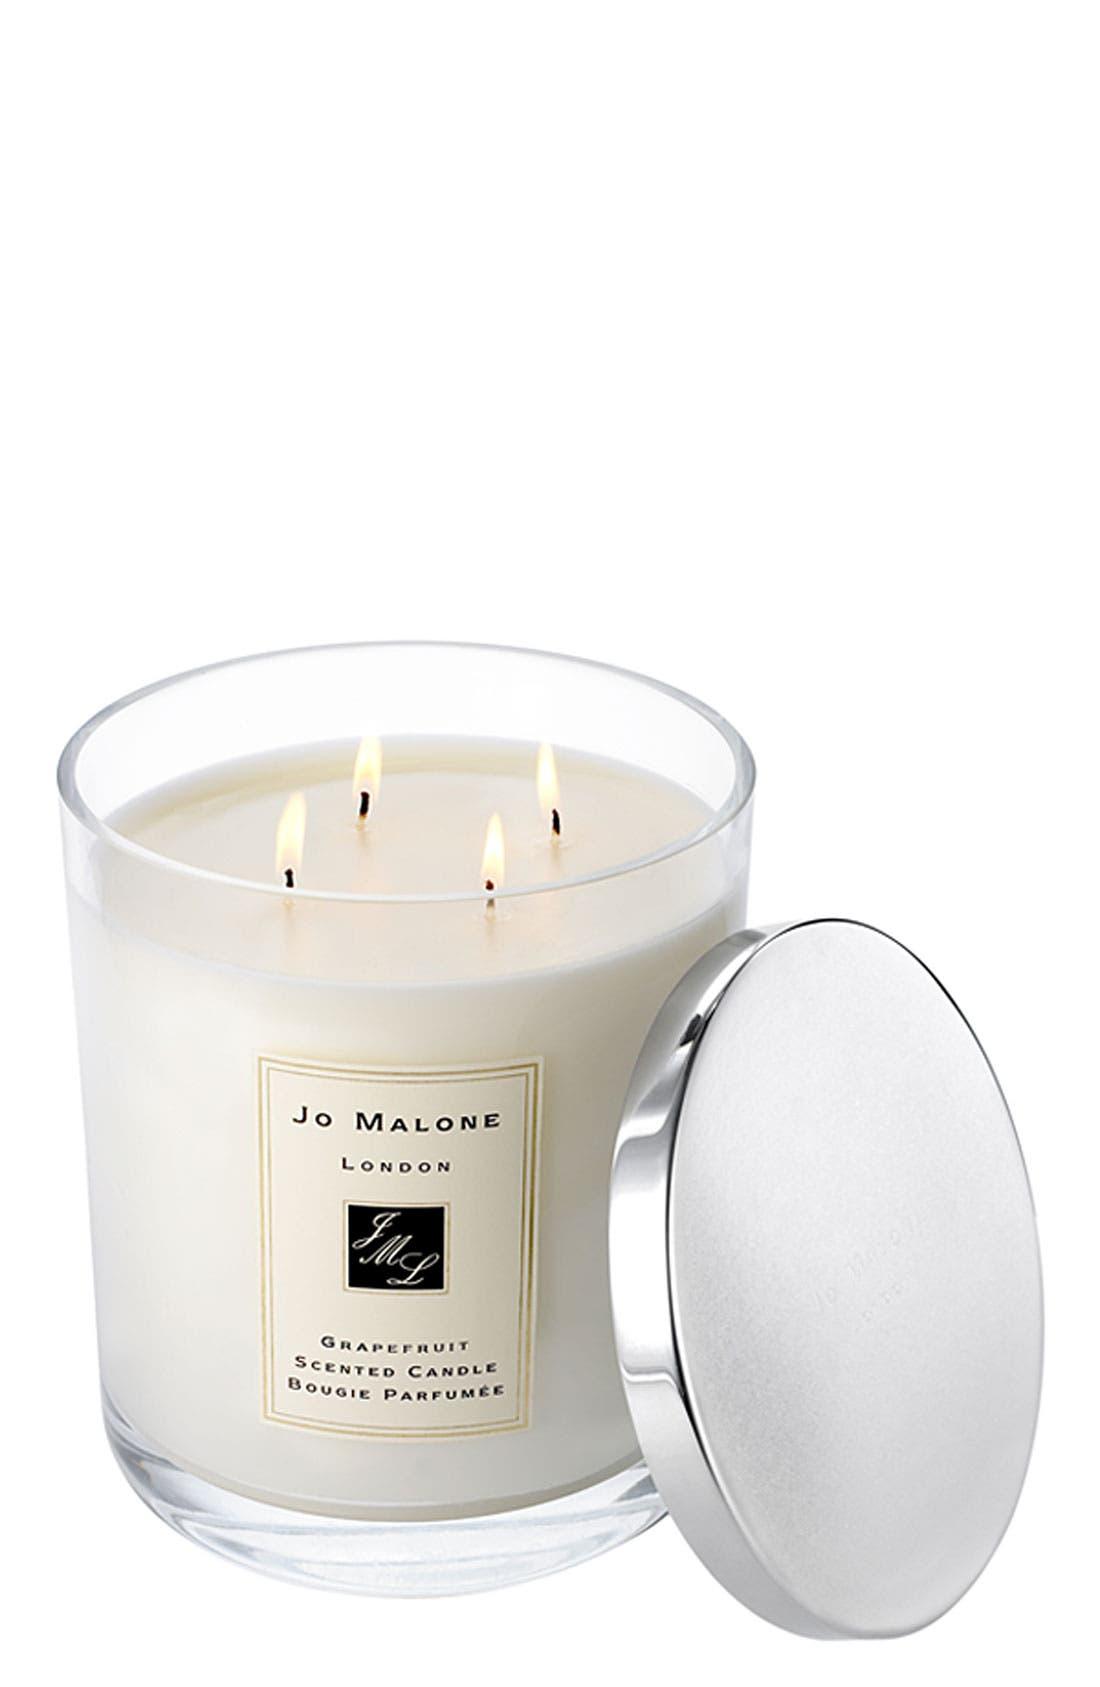 Main Image - Jo Malone™ 'Grapefruit' Luxury Candle